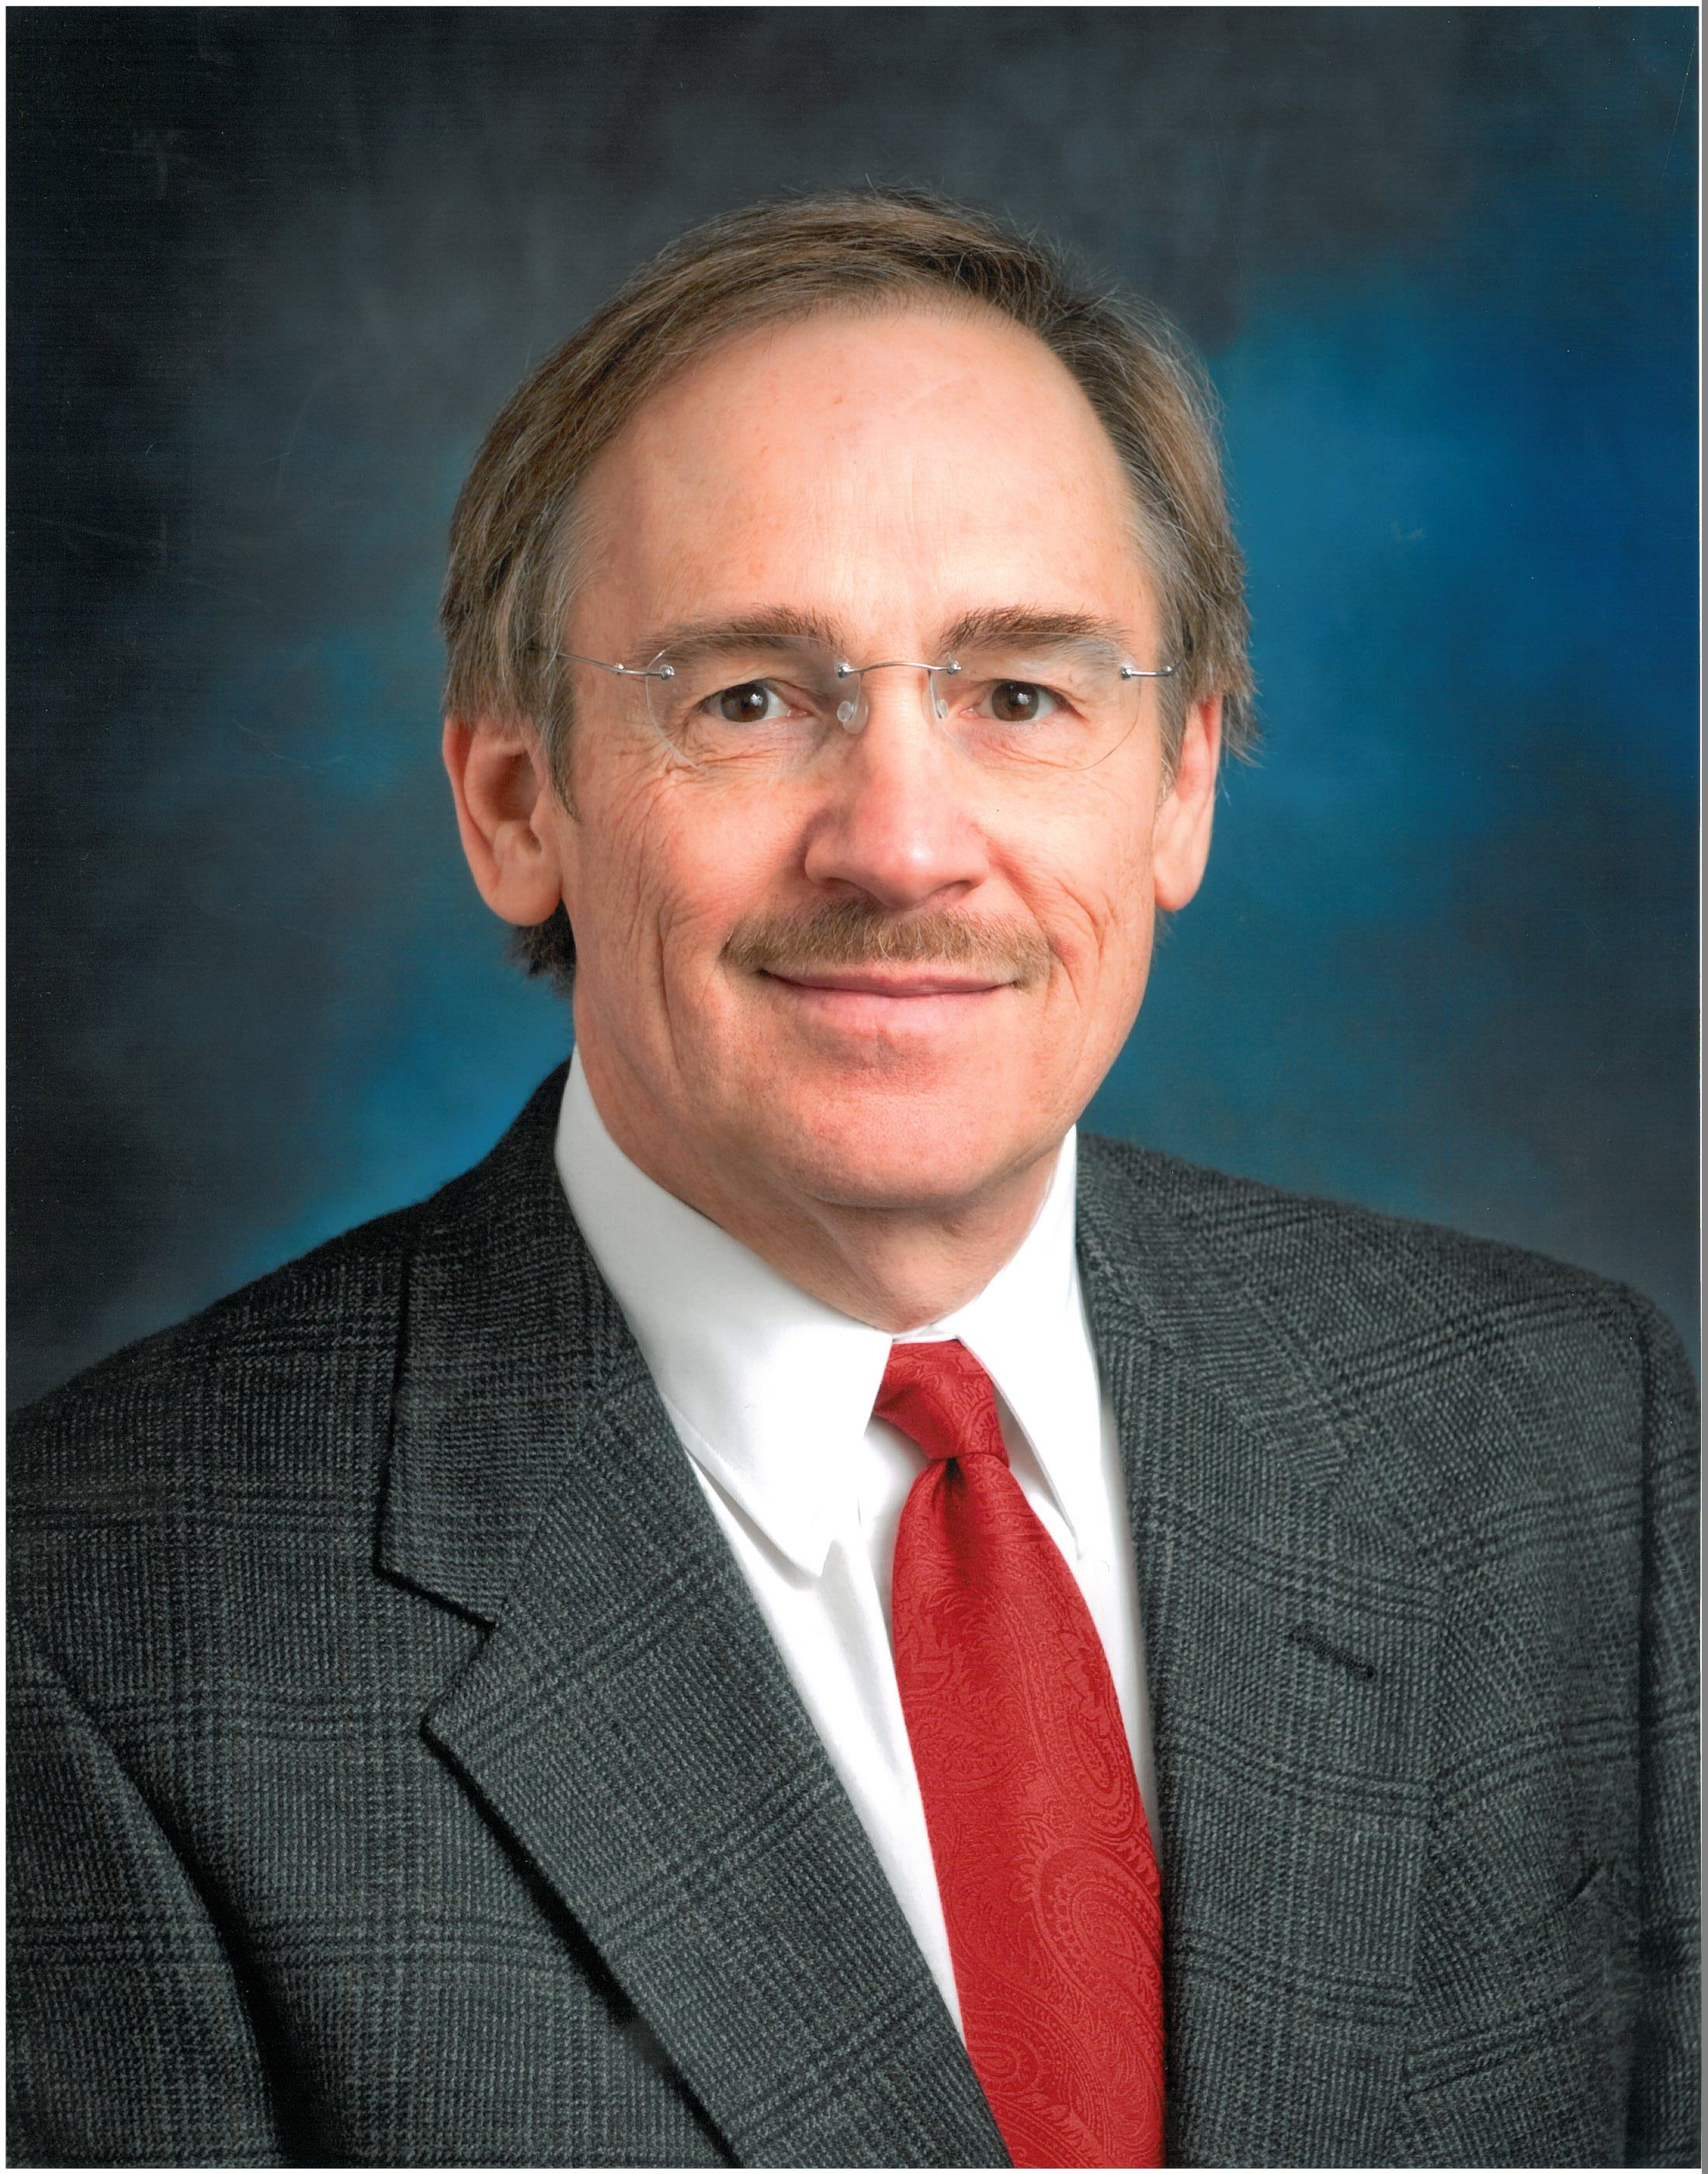 Dr. Donald C. Thompson